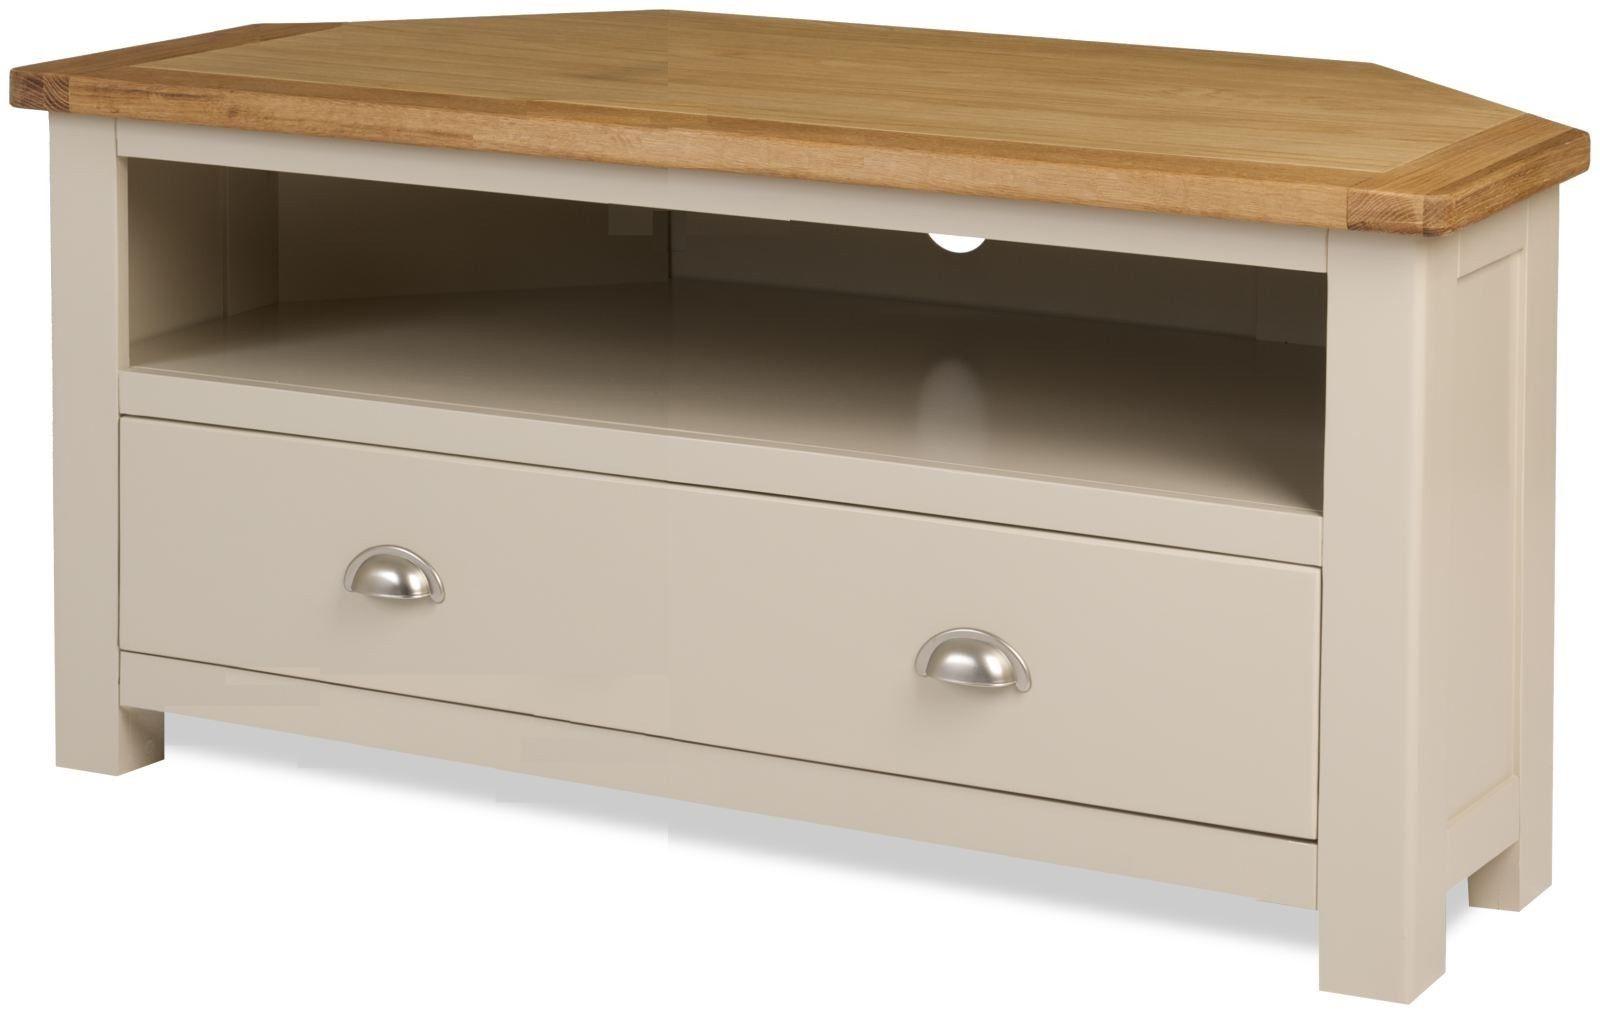 Popular Melton Stone Colour Painted Oak Corner Widescreen Lcd Plasma Tv For Oak Widescreen Tv Units (View 16 of 20)